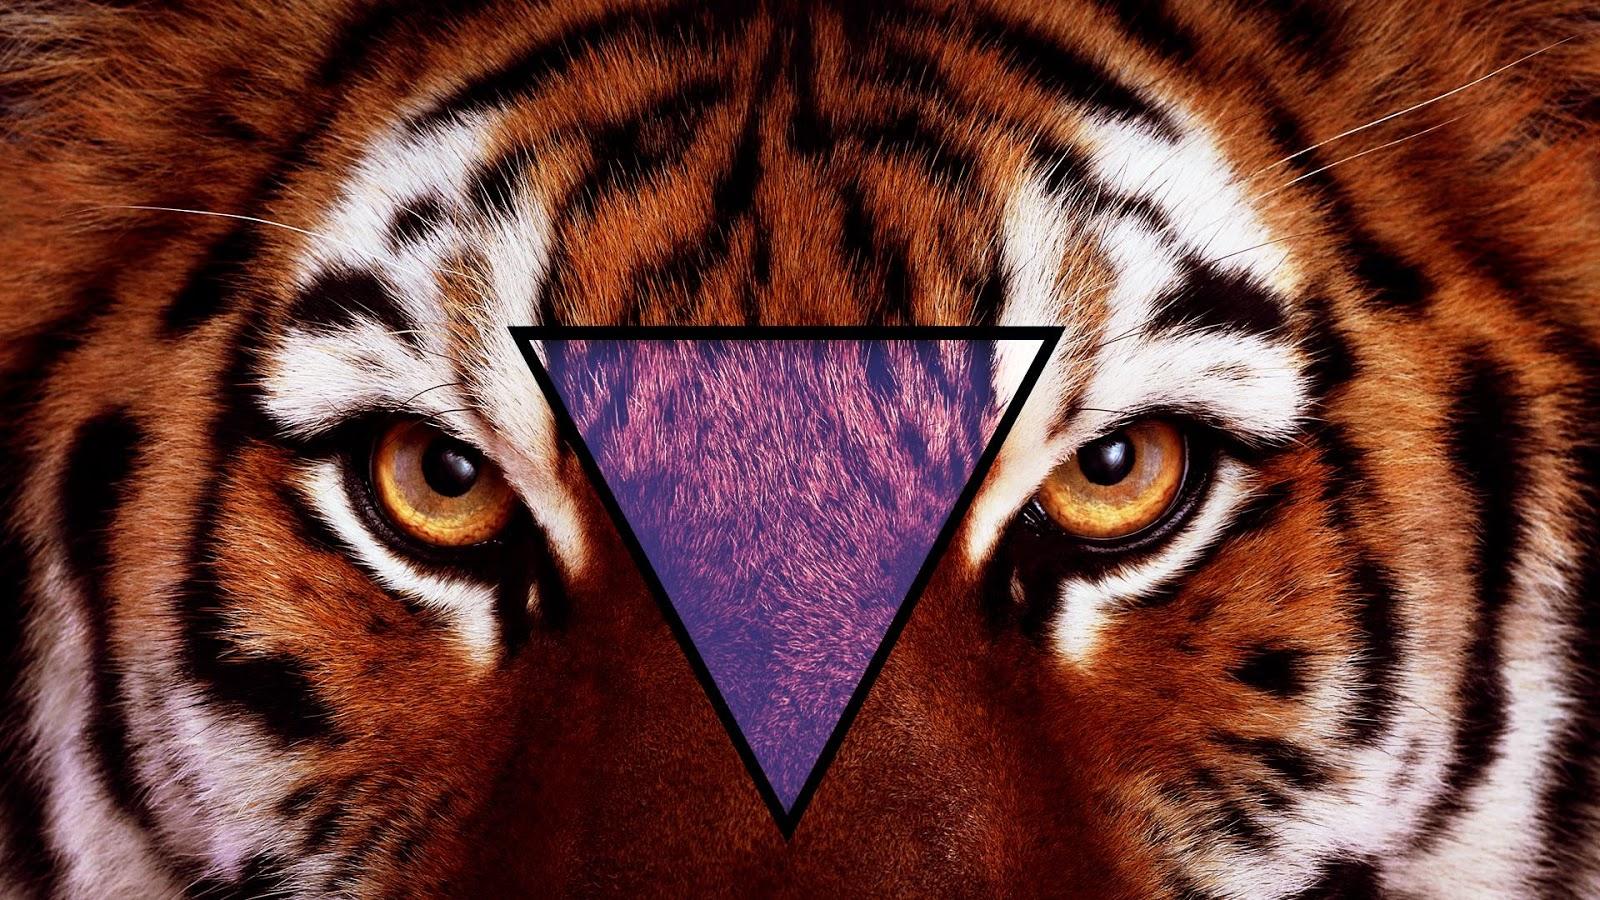 Tiger tumblr hipster wallpaper - photo#17